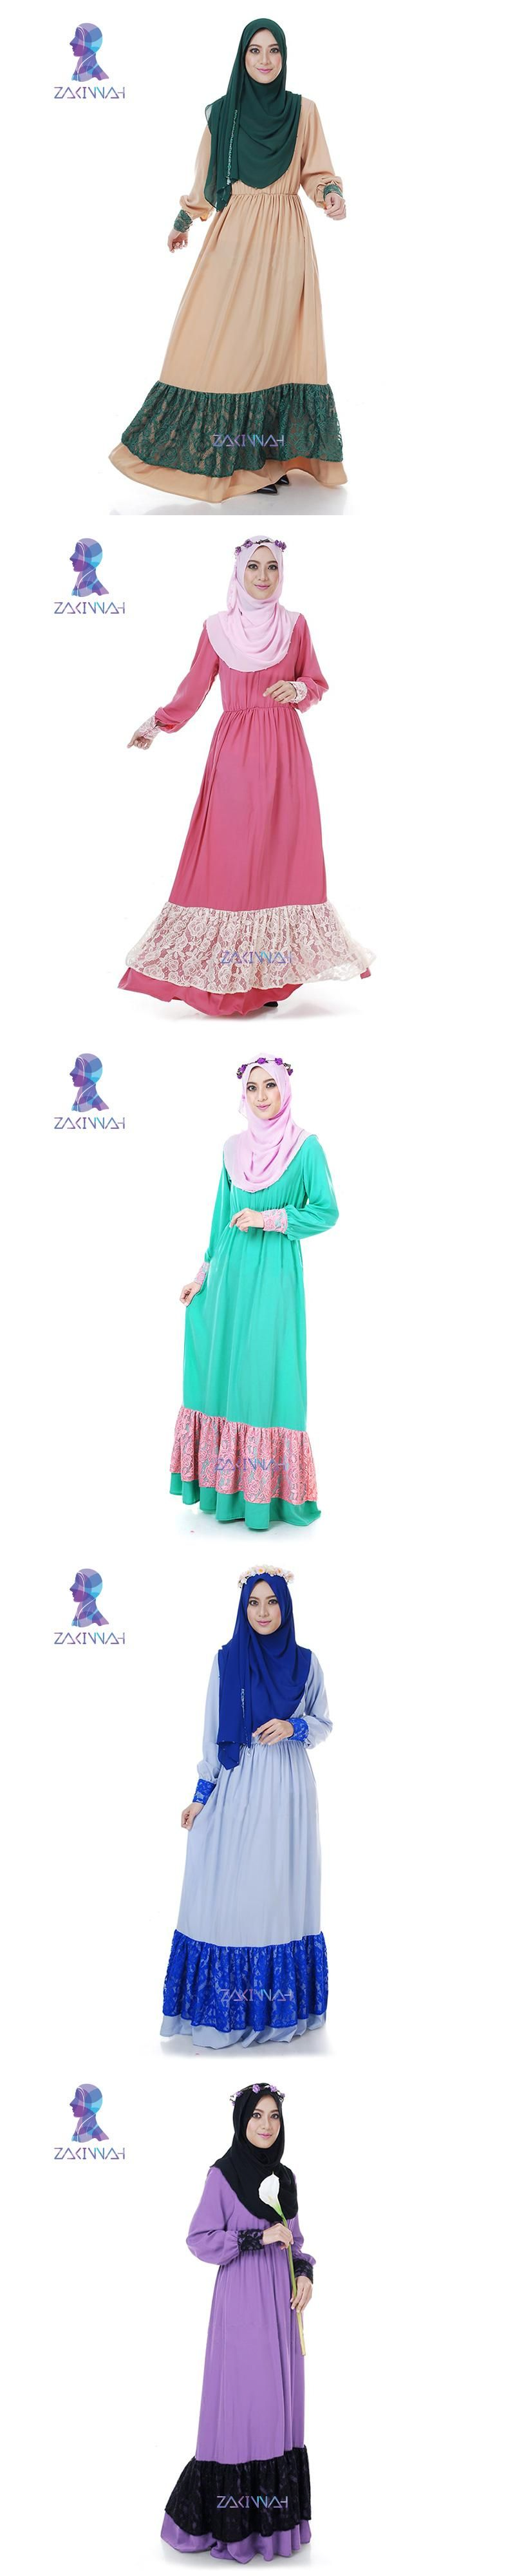 ccb68545cc9 A004 Maxi Dress dubai Muslim abaya choir robes burqa for women clothes new Women  Dress turkish islamic clothing robe musulmane